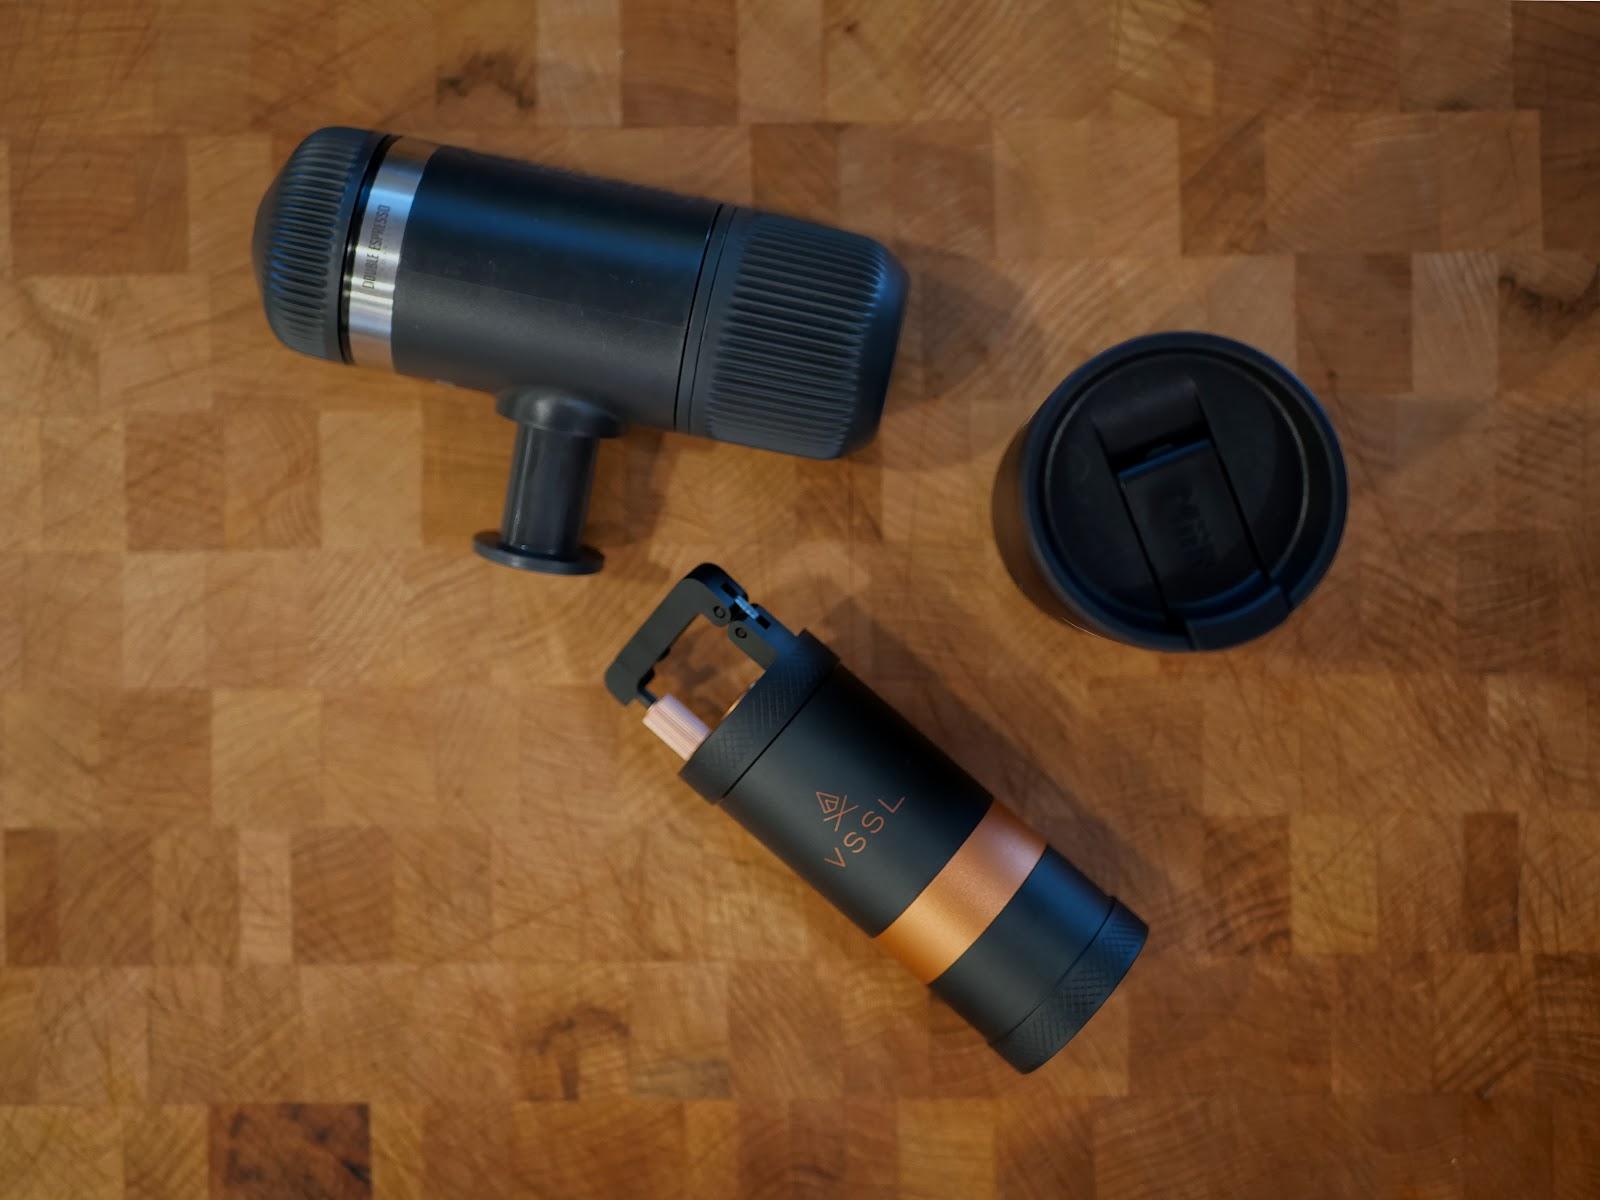 Portable coffee grinder